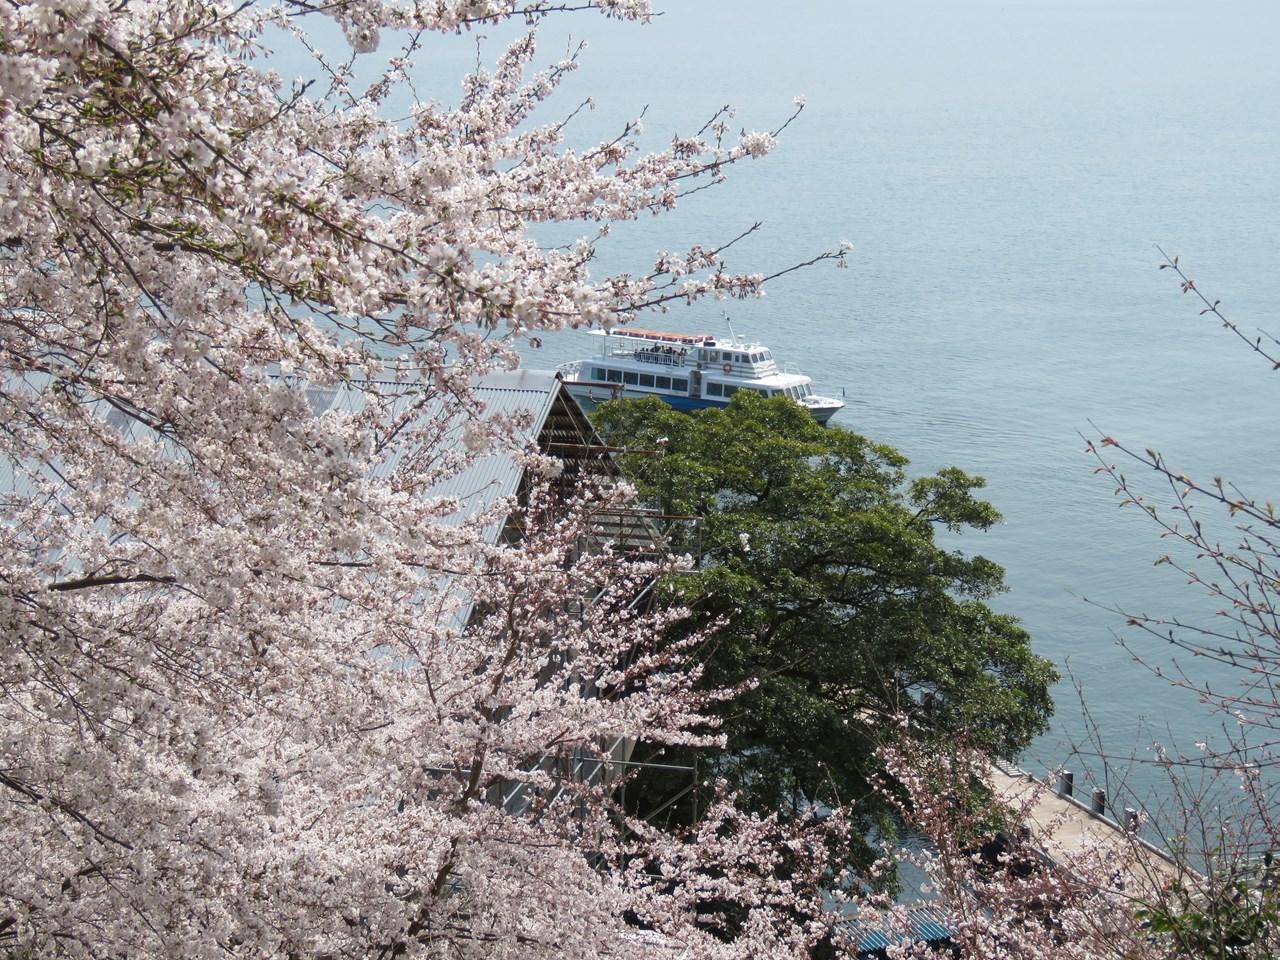 s-竹生島サクラ